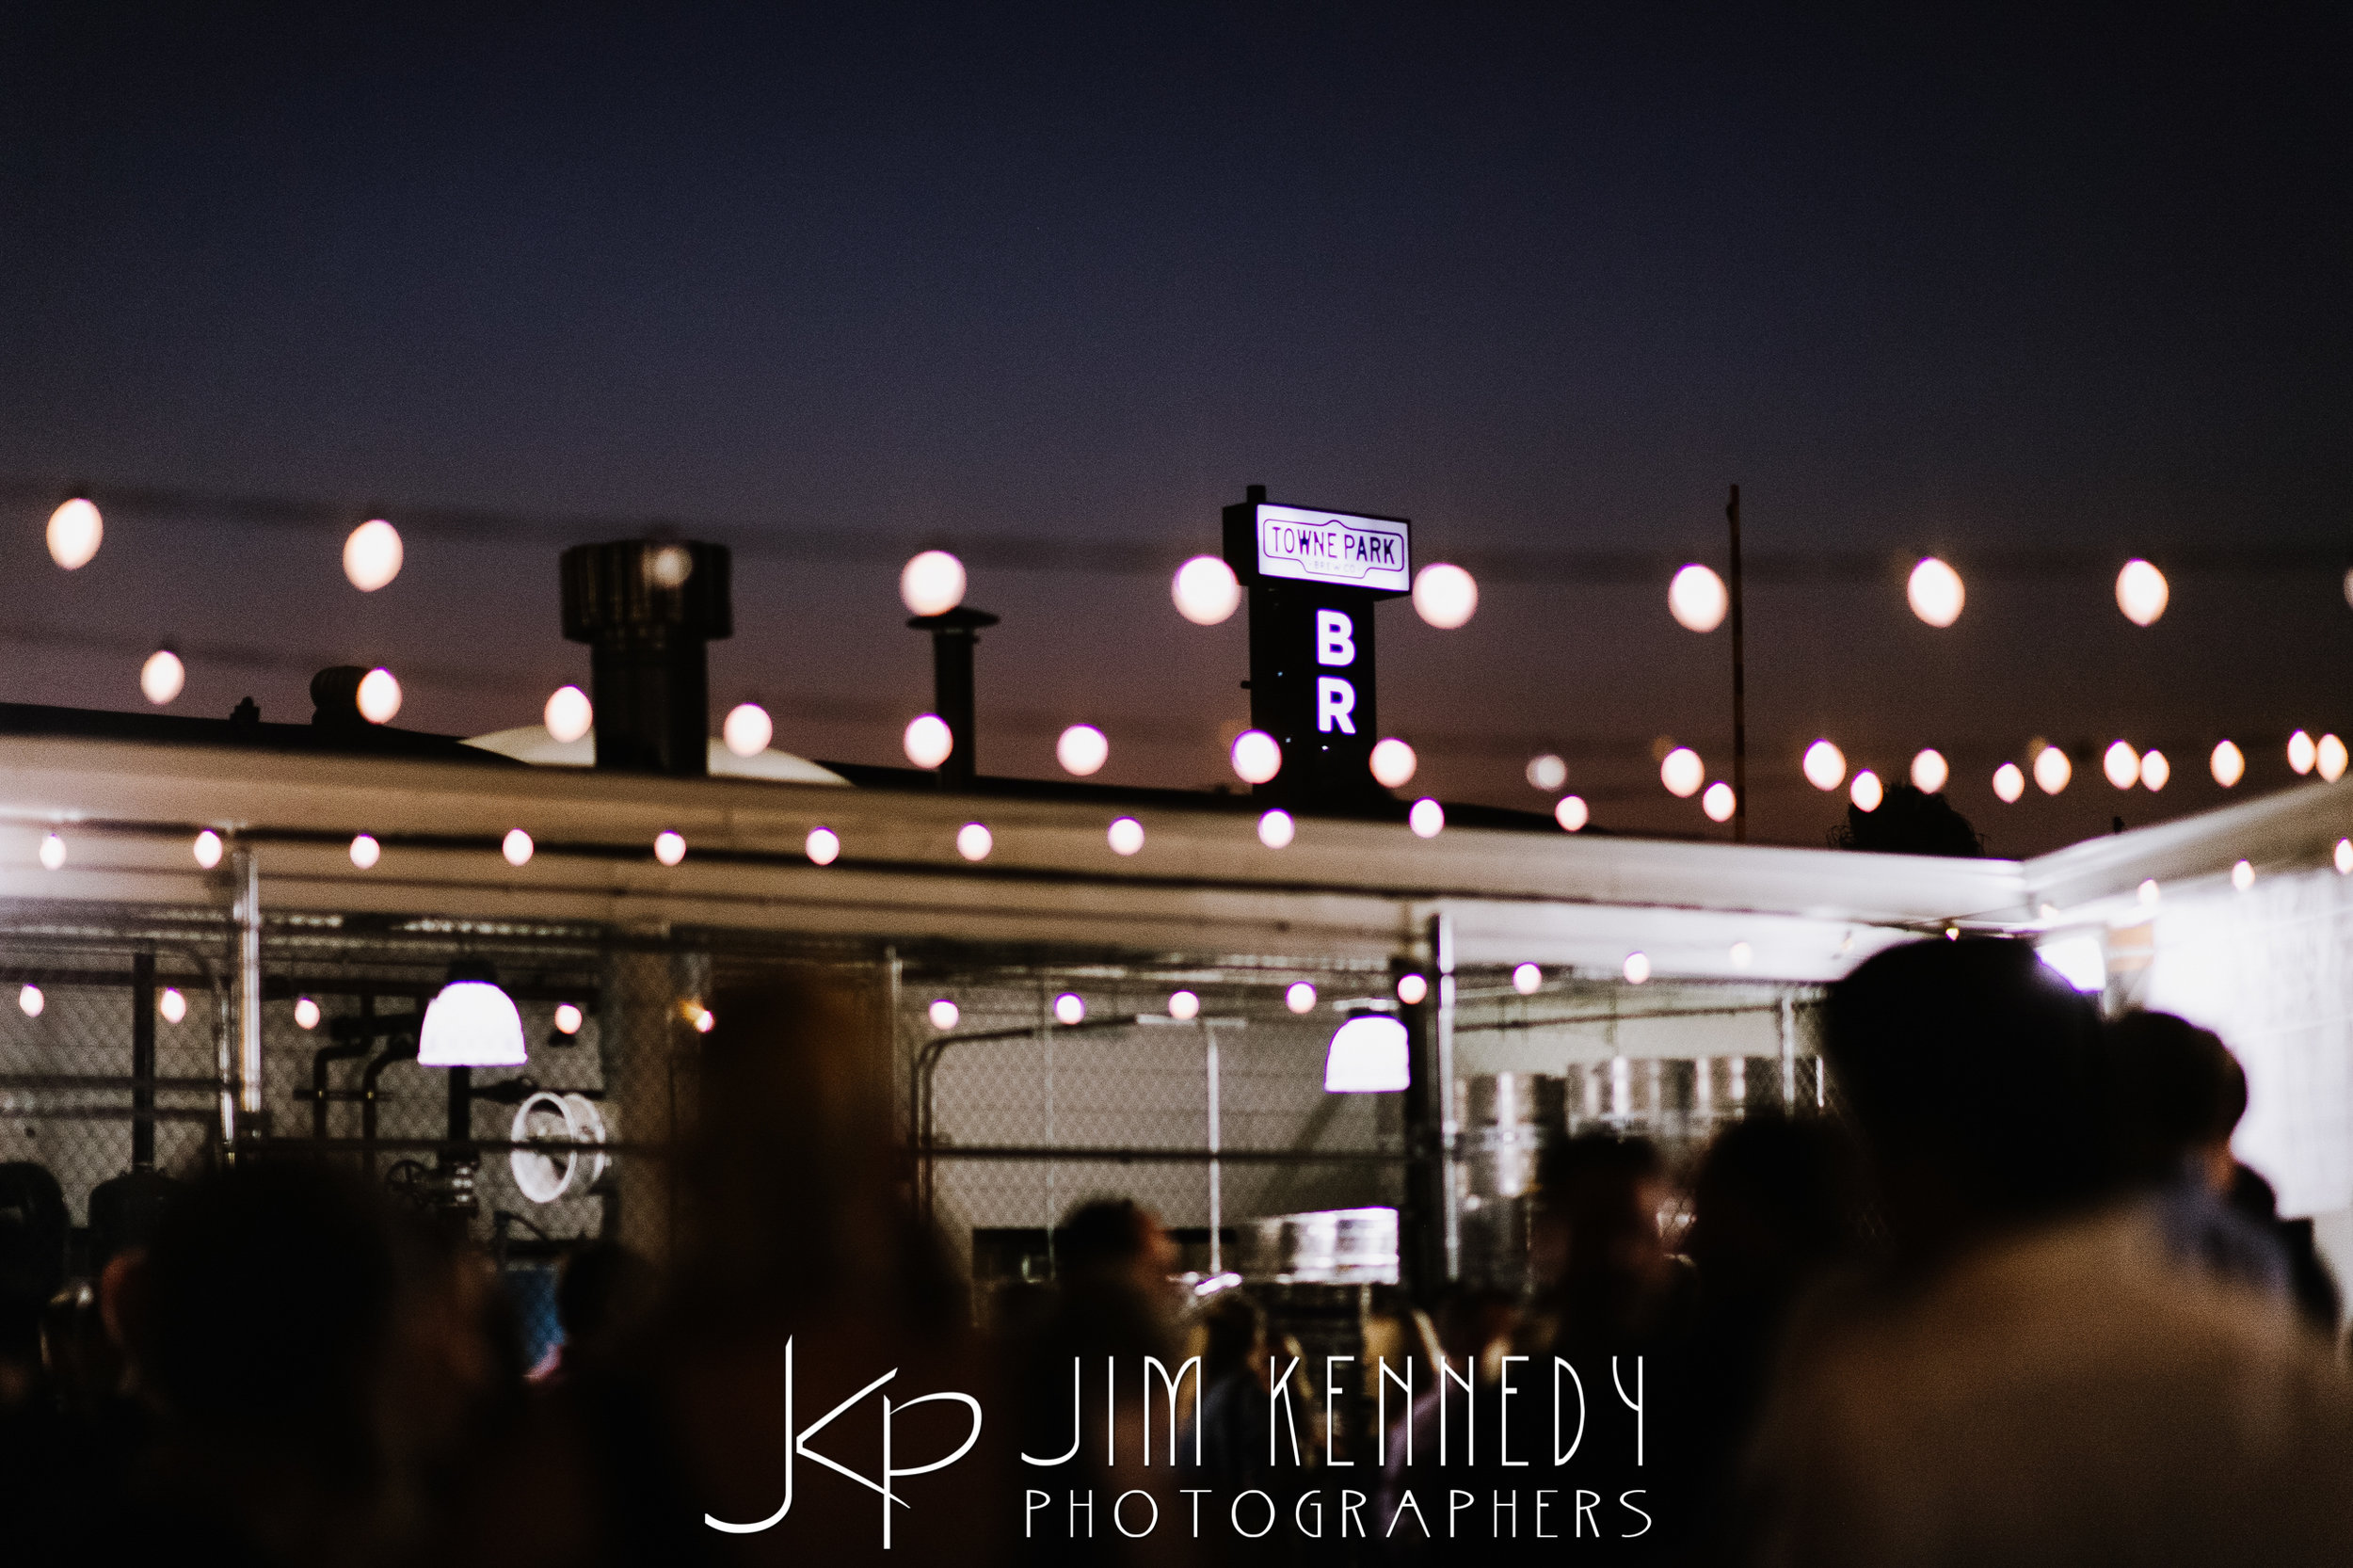 jim_kennedy_photographers_towne_park-1552.jpg